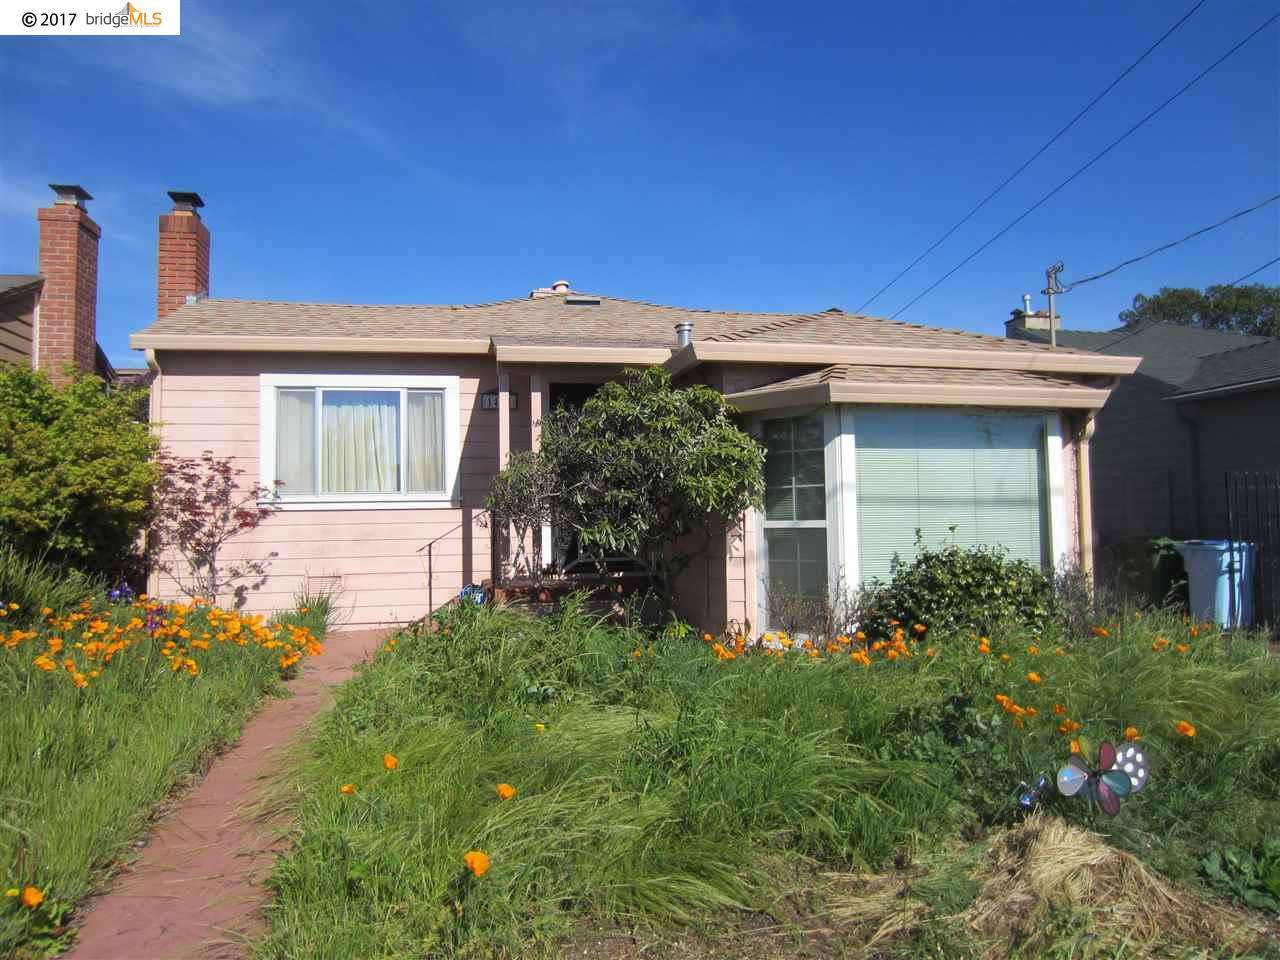 1481 9th St., BERKELEY, CA 94710